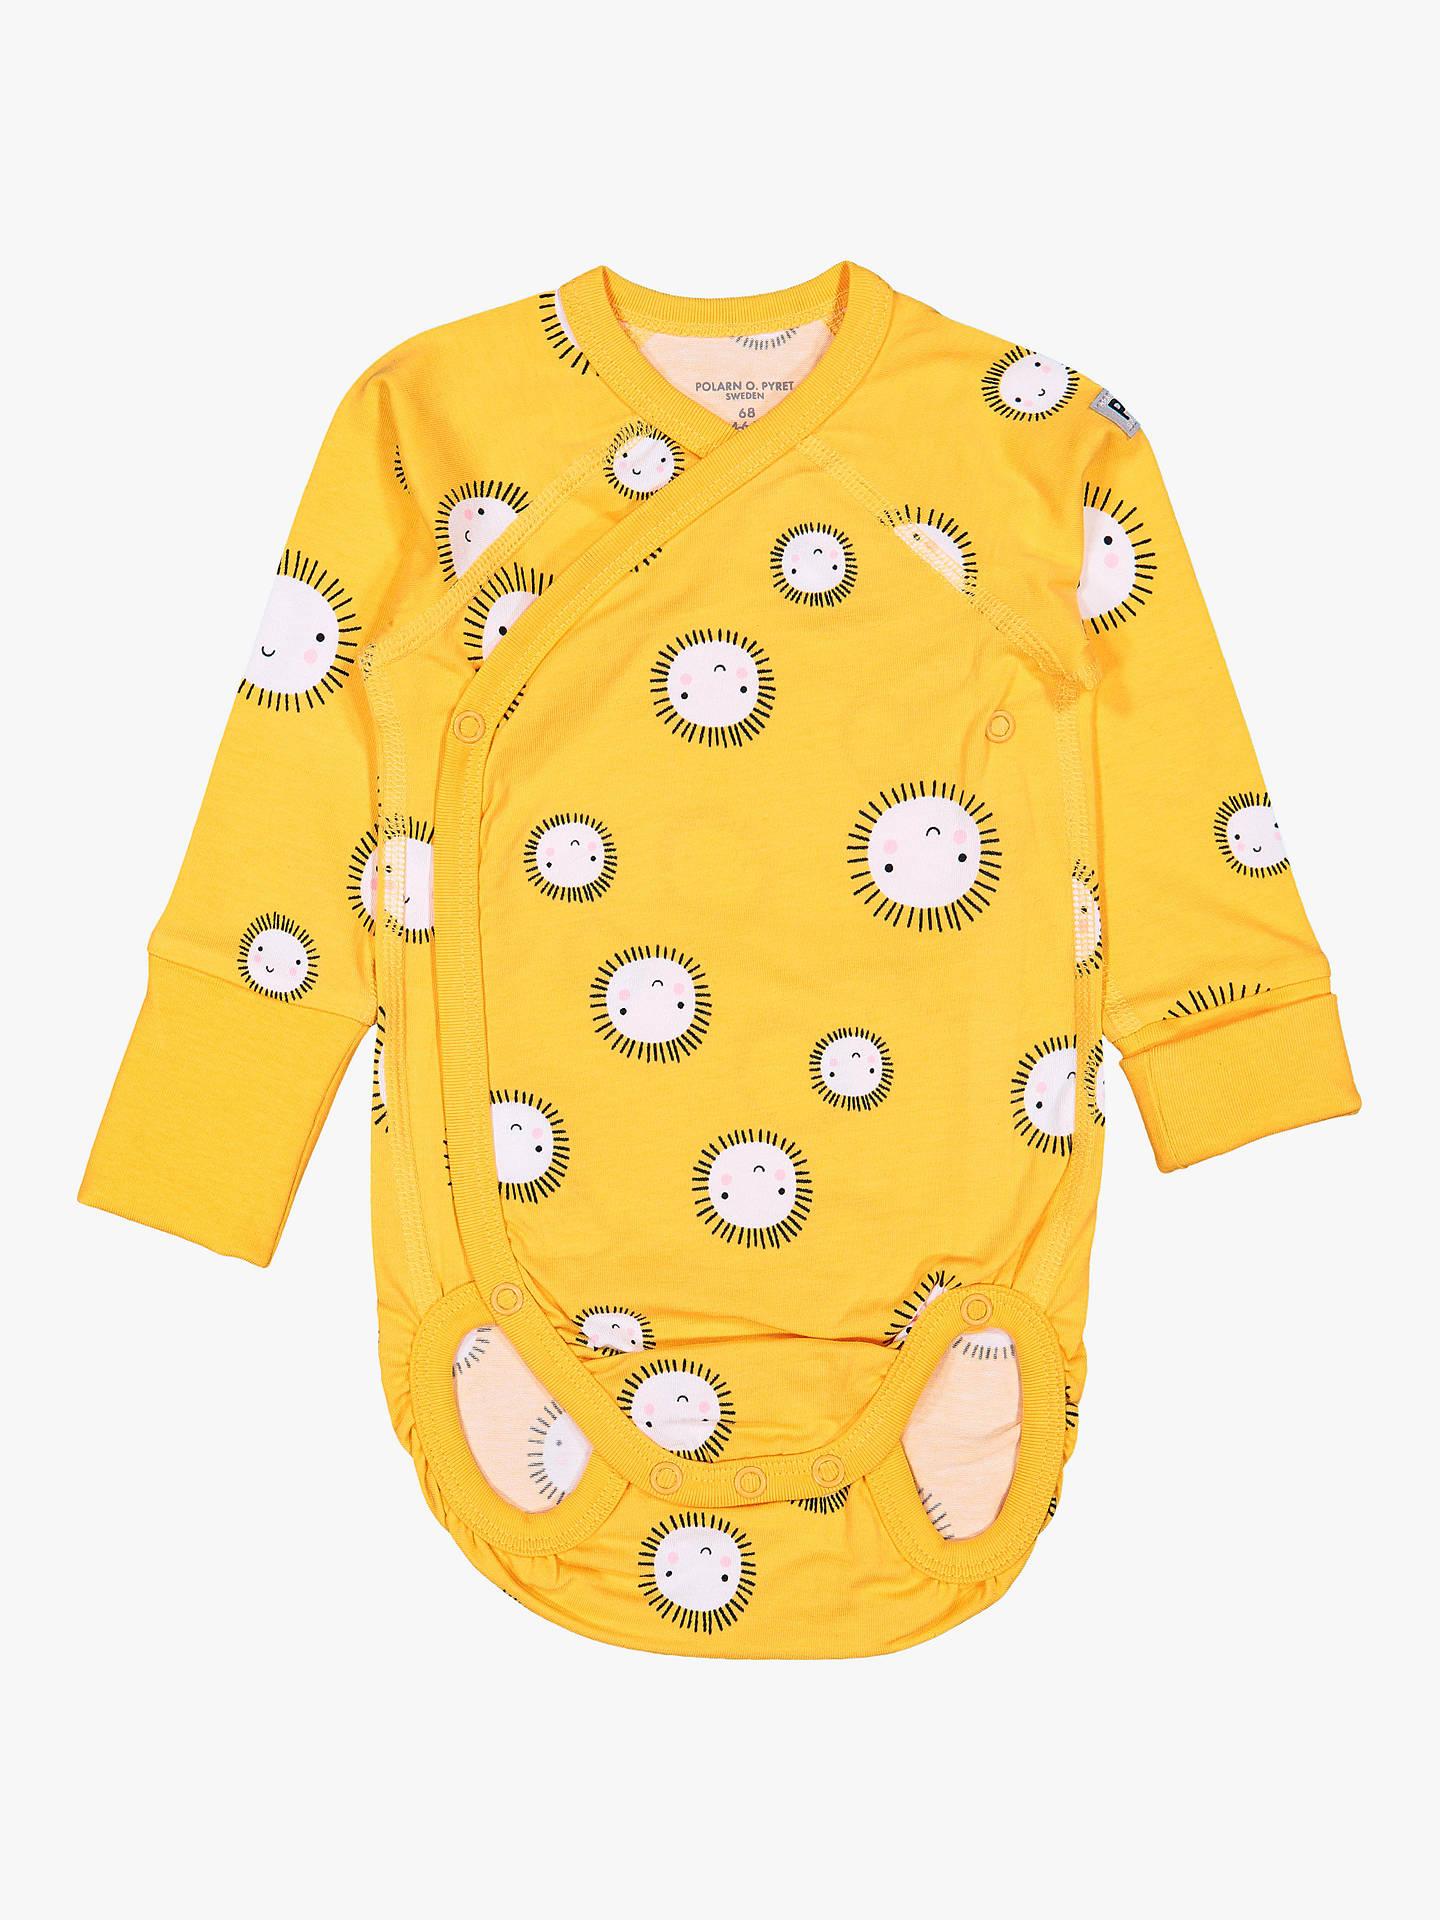 05640a6b4 Polarn O. Pyret Baby Organic Cotton Sun Bodysuit